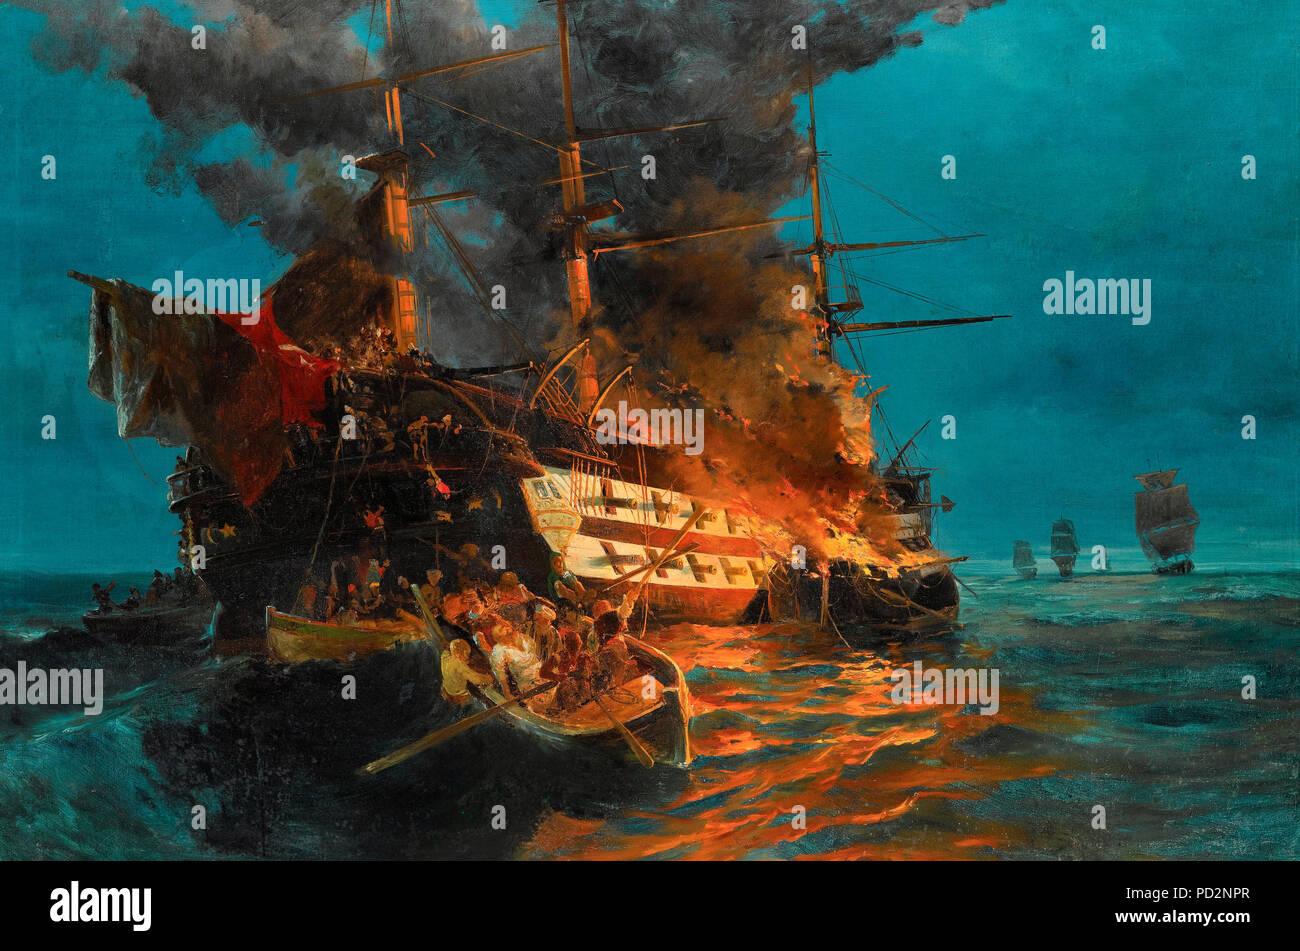 The burning of a Turkish frigate - Konstantinos Volanakis - Stock Image